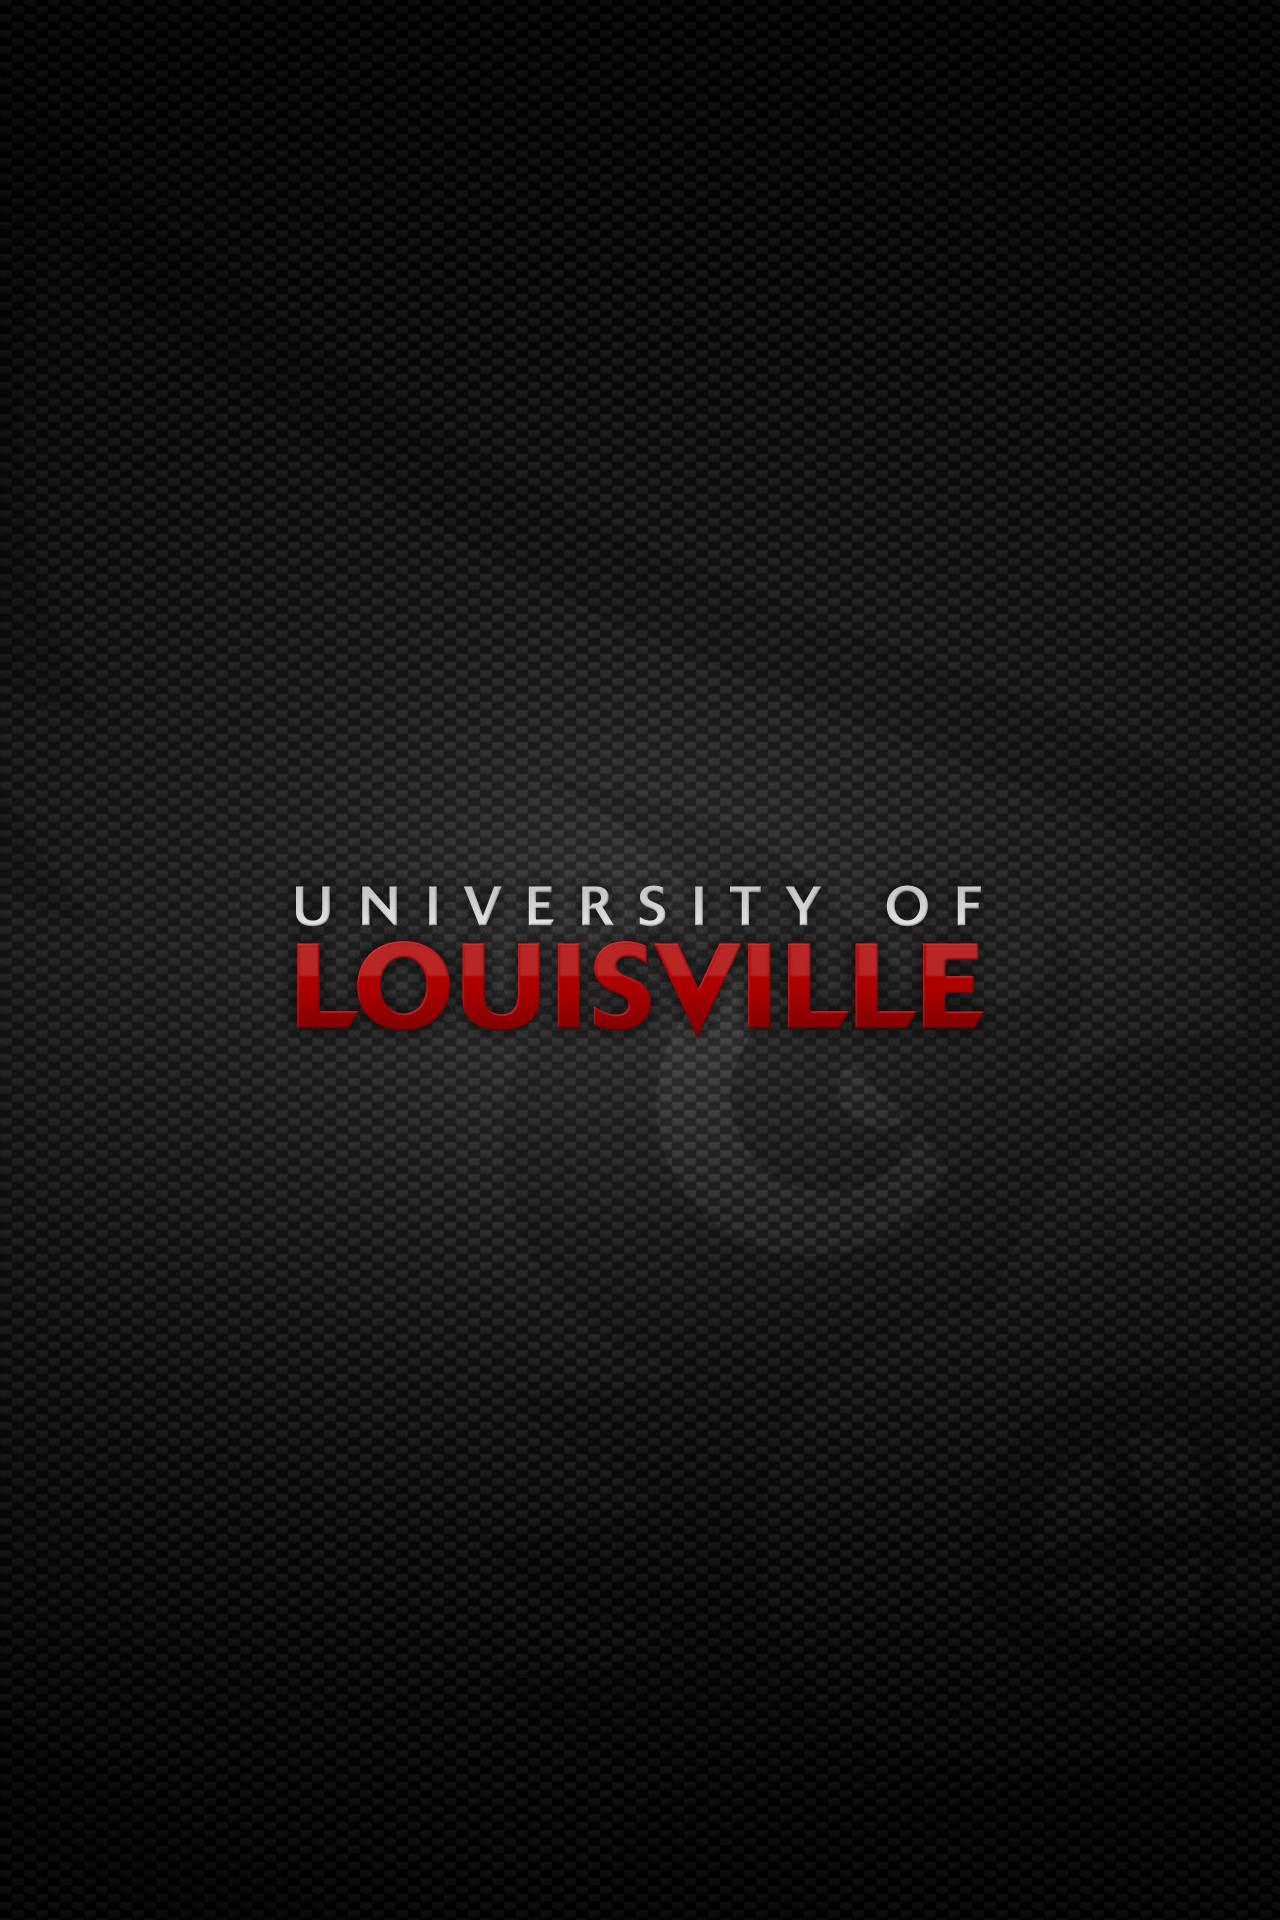 Louisville Cardinals HD Wallpapers in FHDQ | 1280×1920, by Beverley Hayward